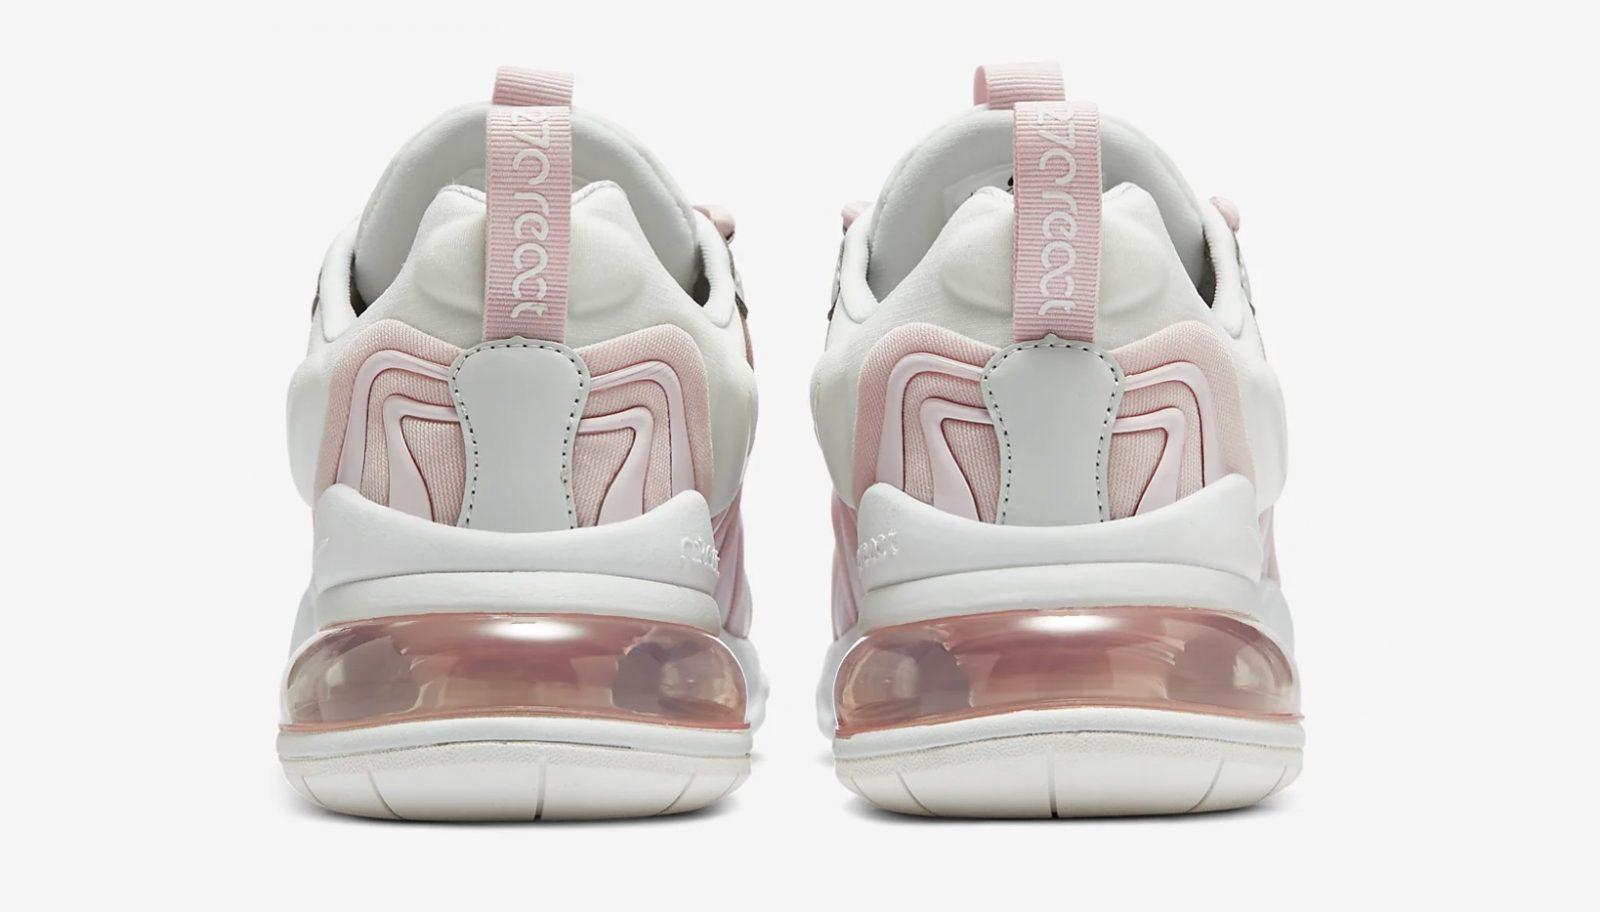 Nike Air Max 270 React ENG Photon Dust | CK2595 001 heel